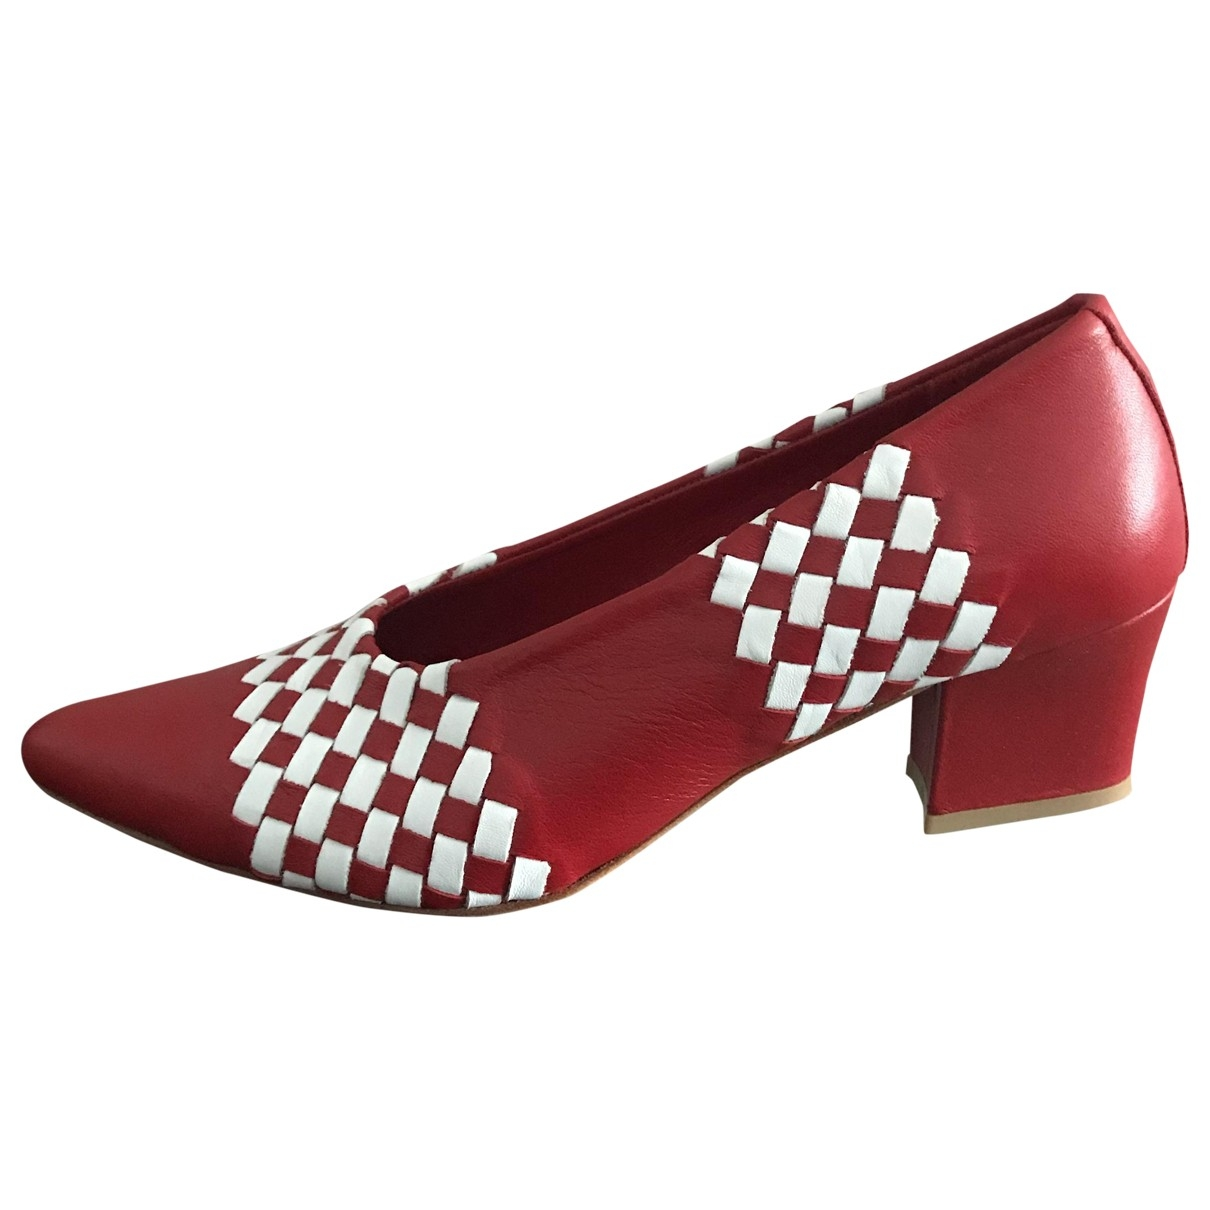 Maryam Nassir Zadeh - Escarpins   pour femme en cuir - rouge